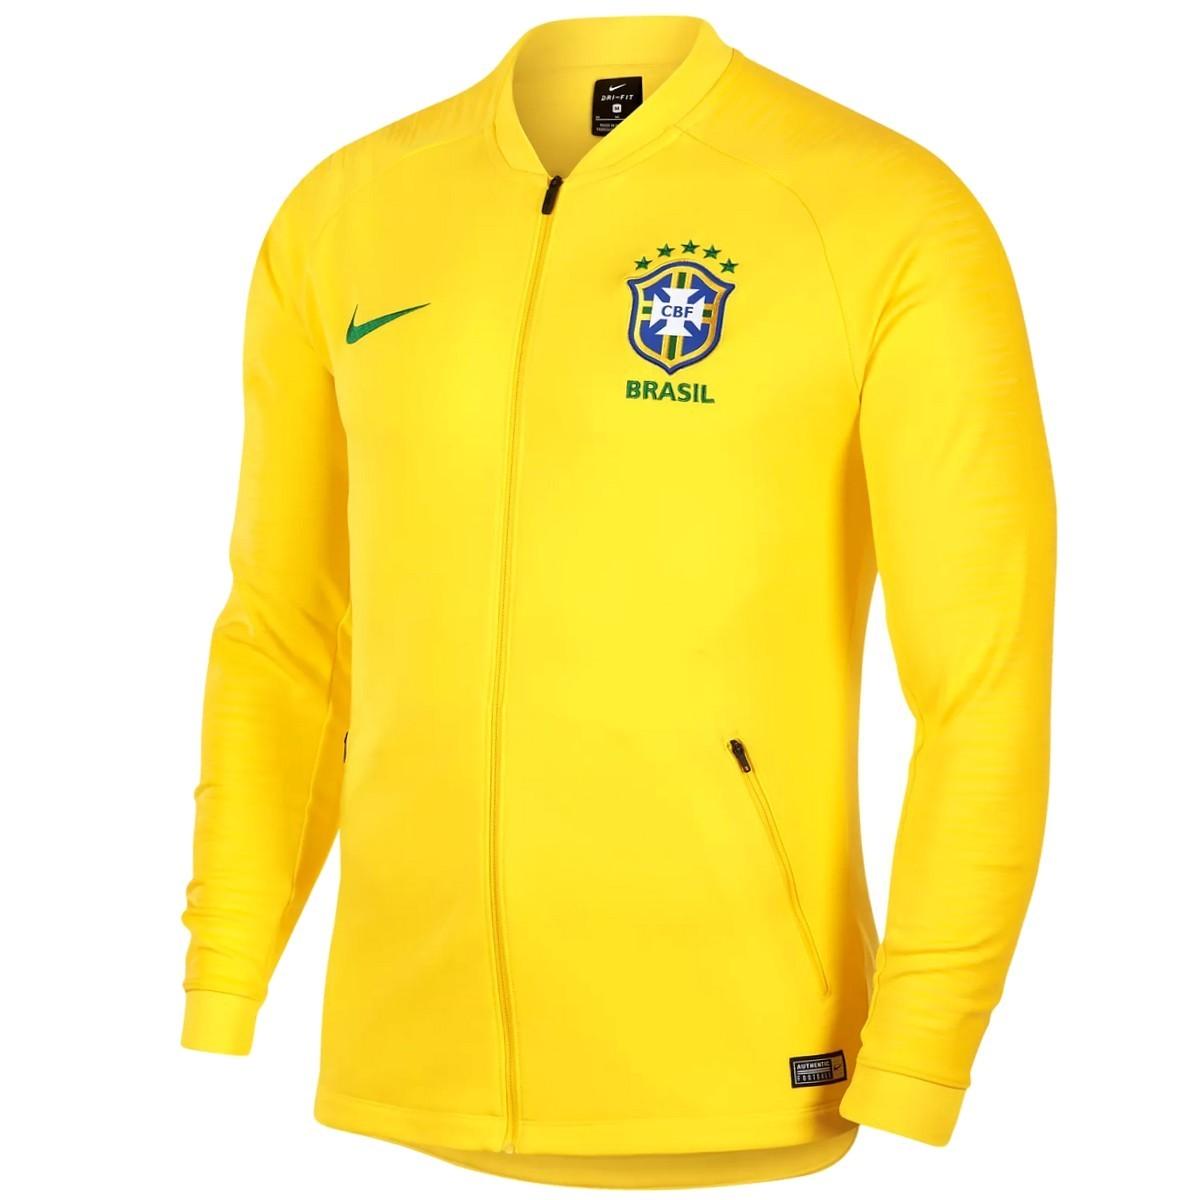 Brasilien Fussball pre match präsentationsjacke 201819